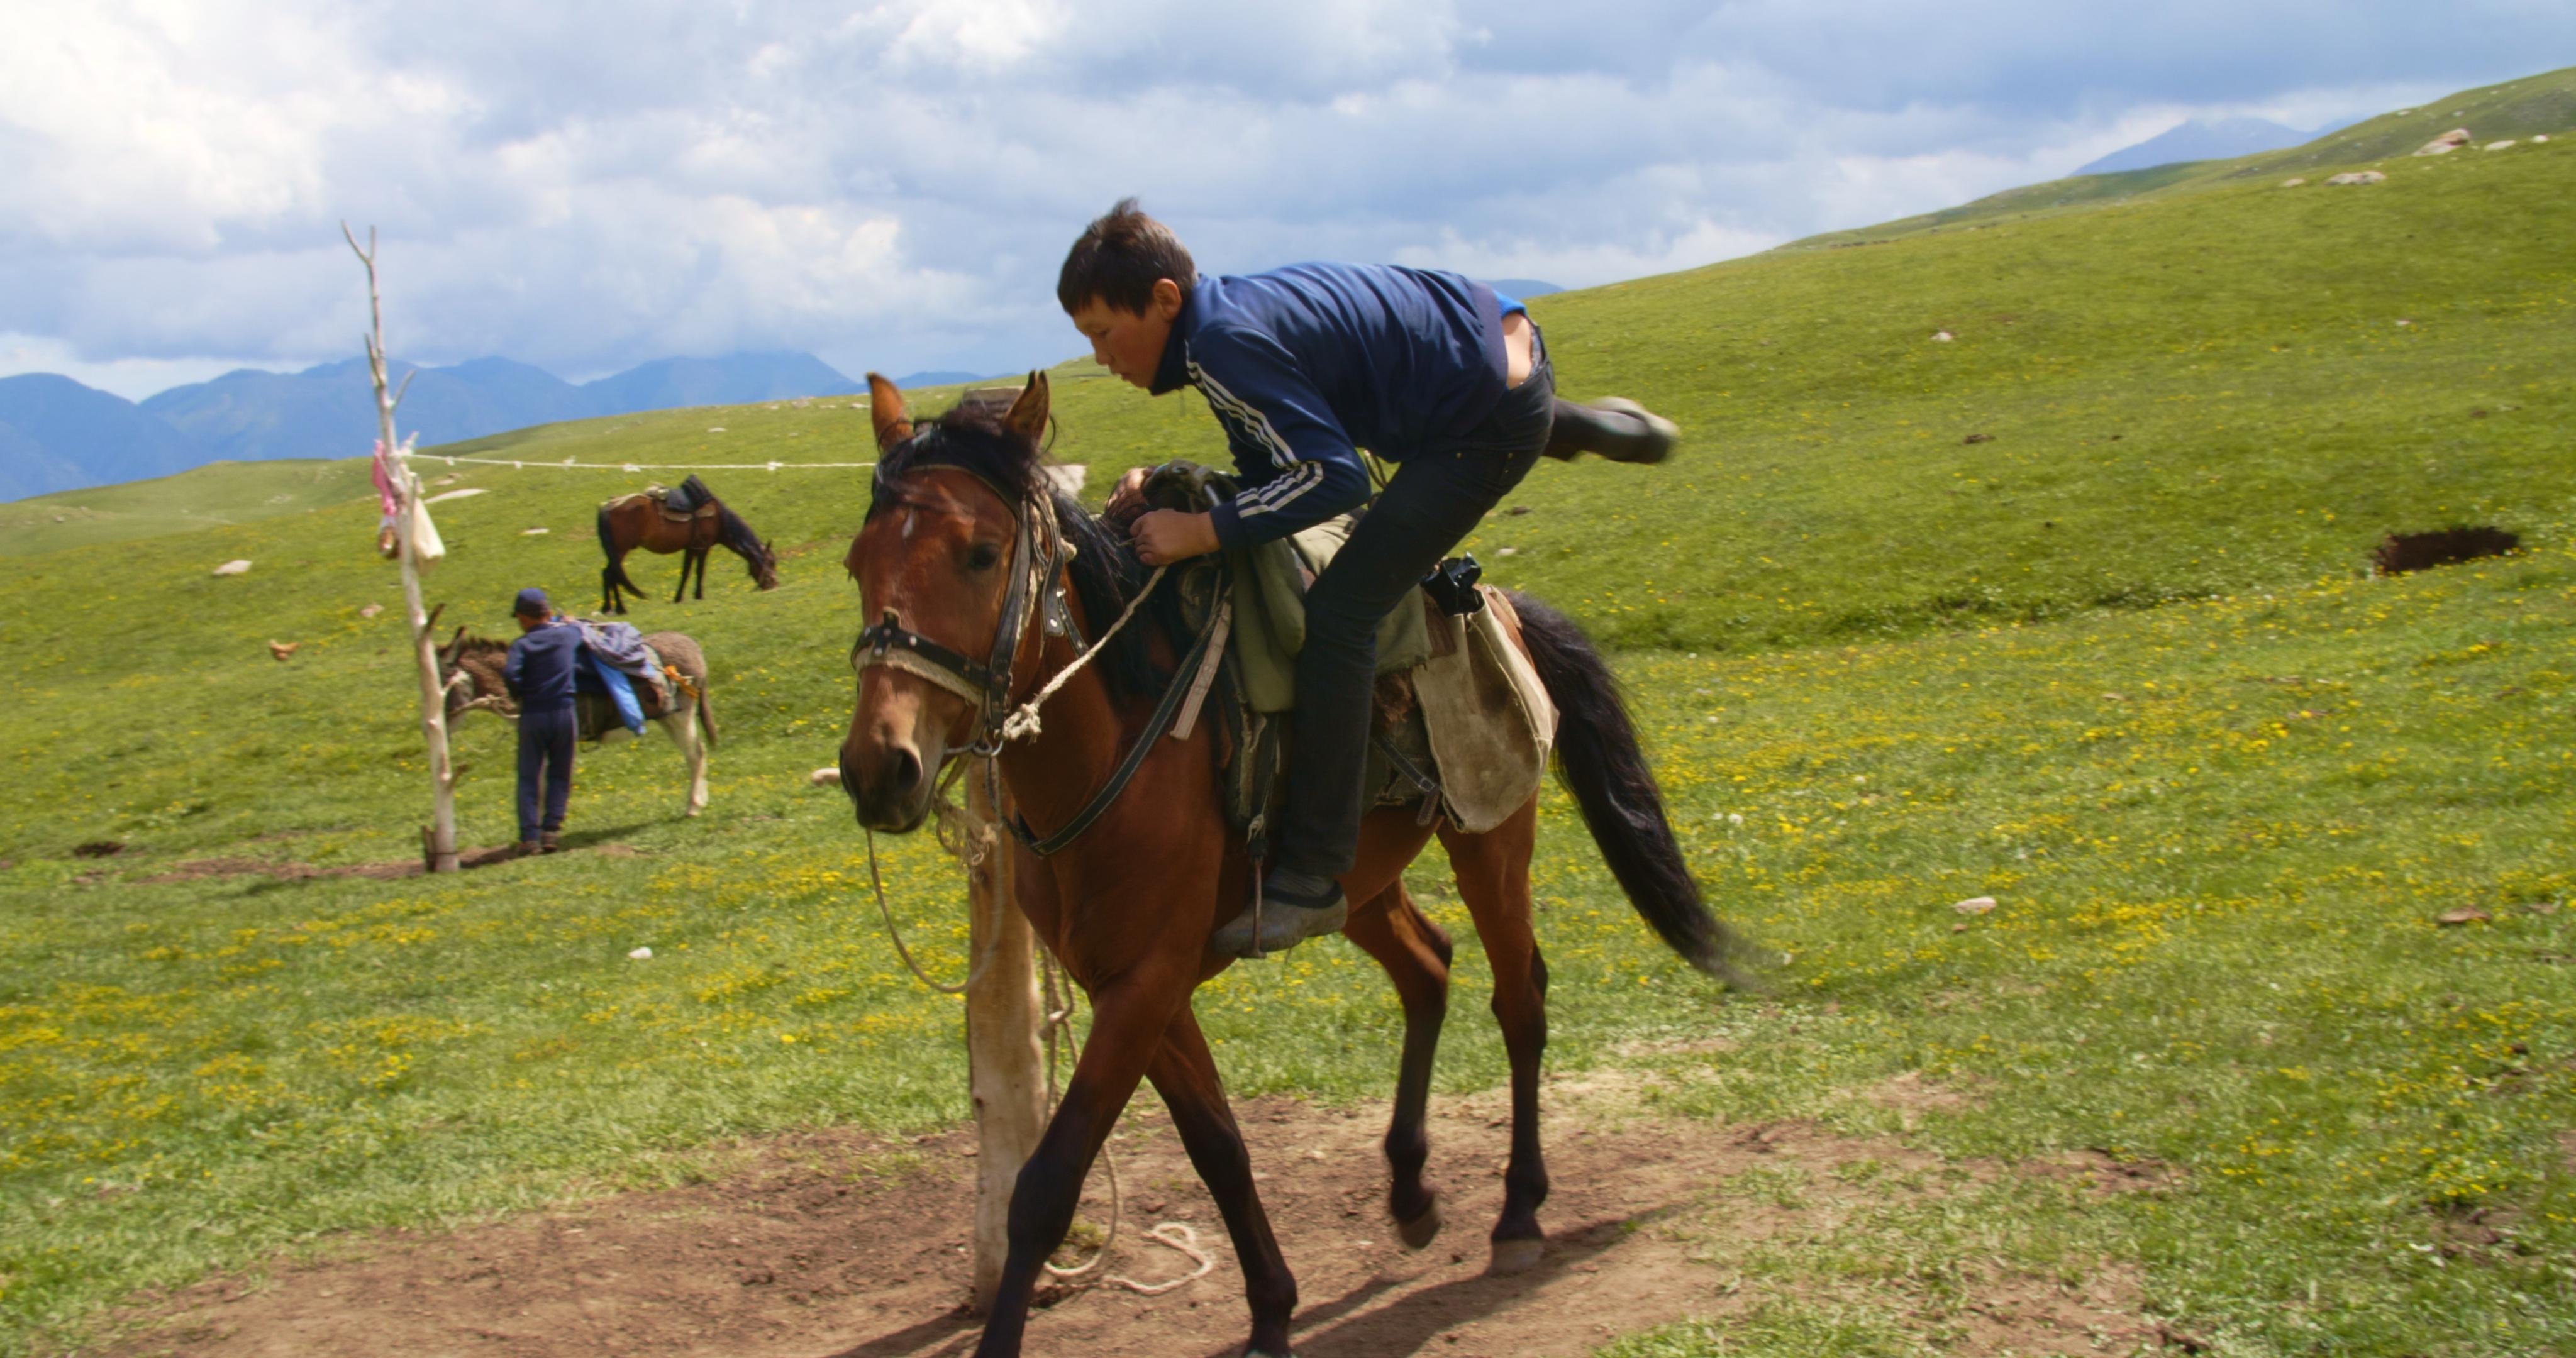 TheBoyFromKyrgyzstan_Stills_1.33.2